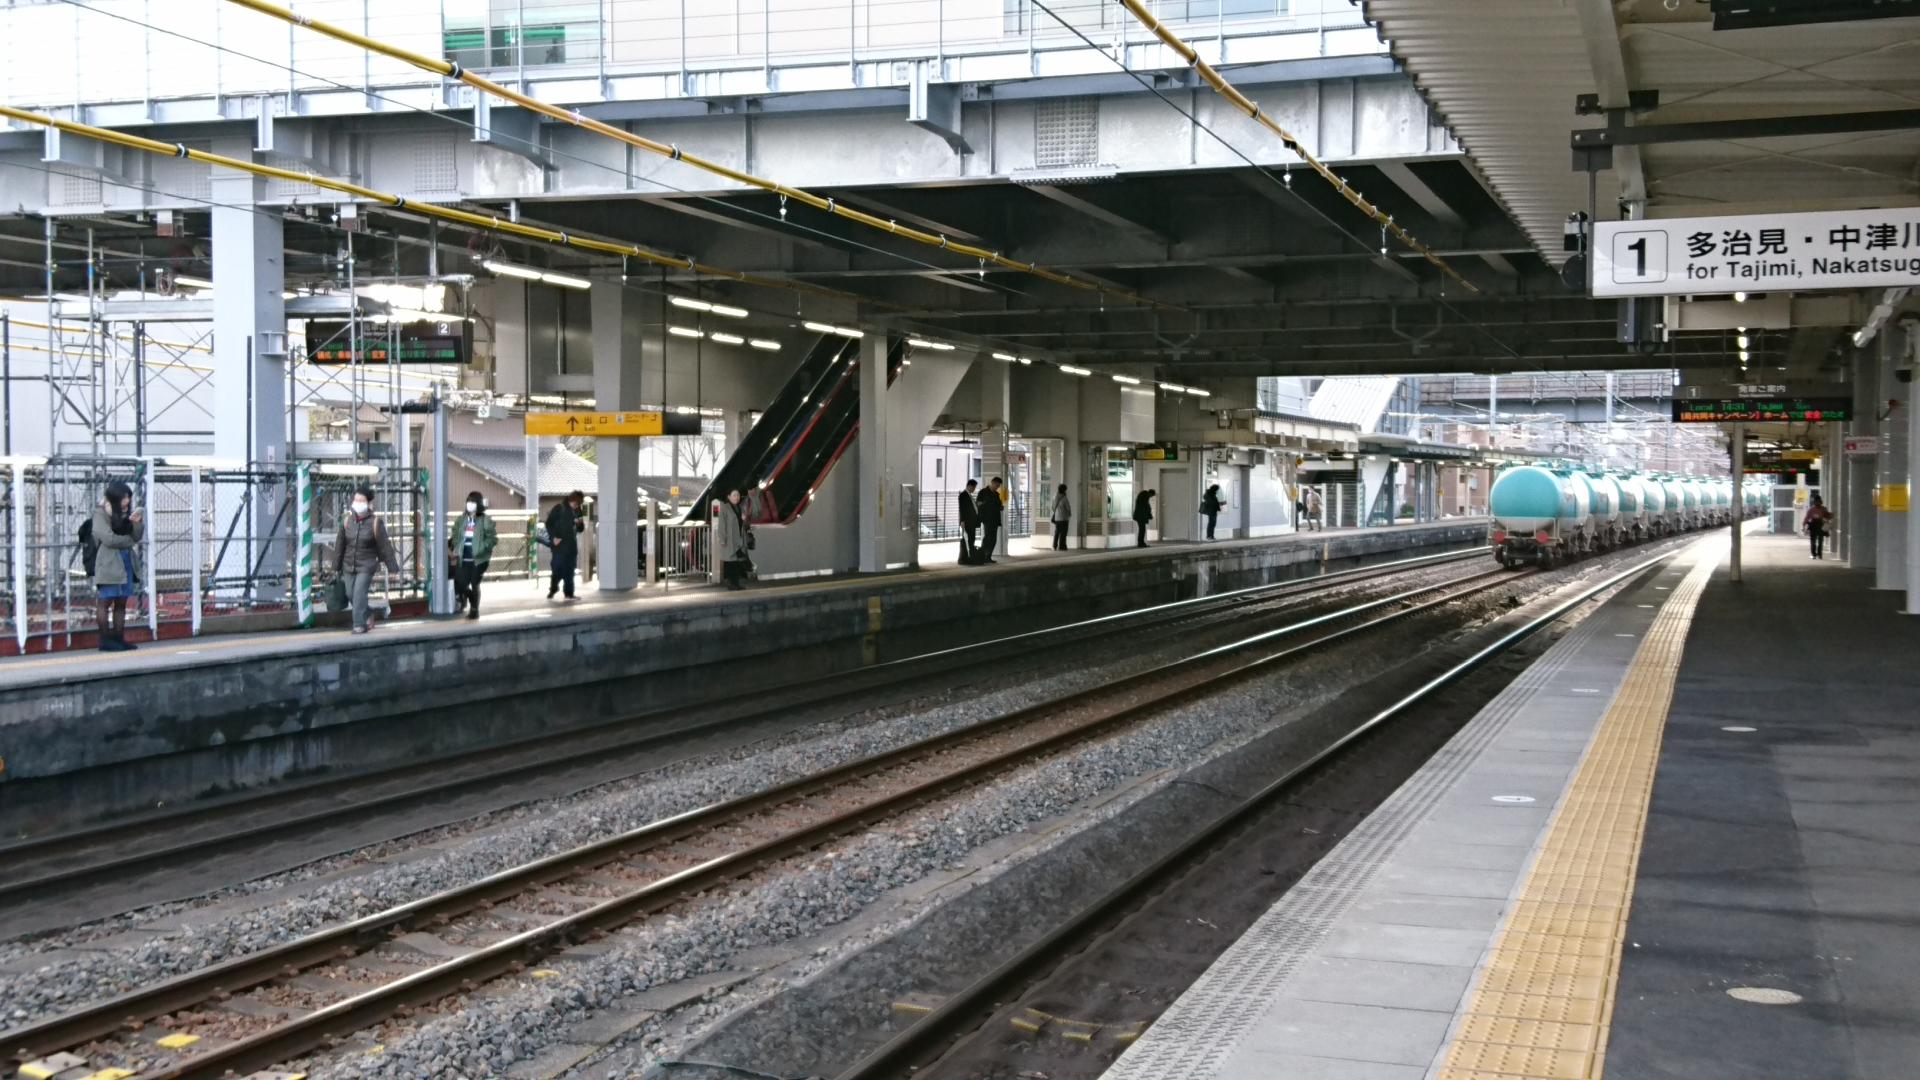 2016.12.14 春日井 (1) ホーム 1920-1080